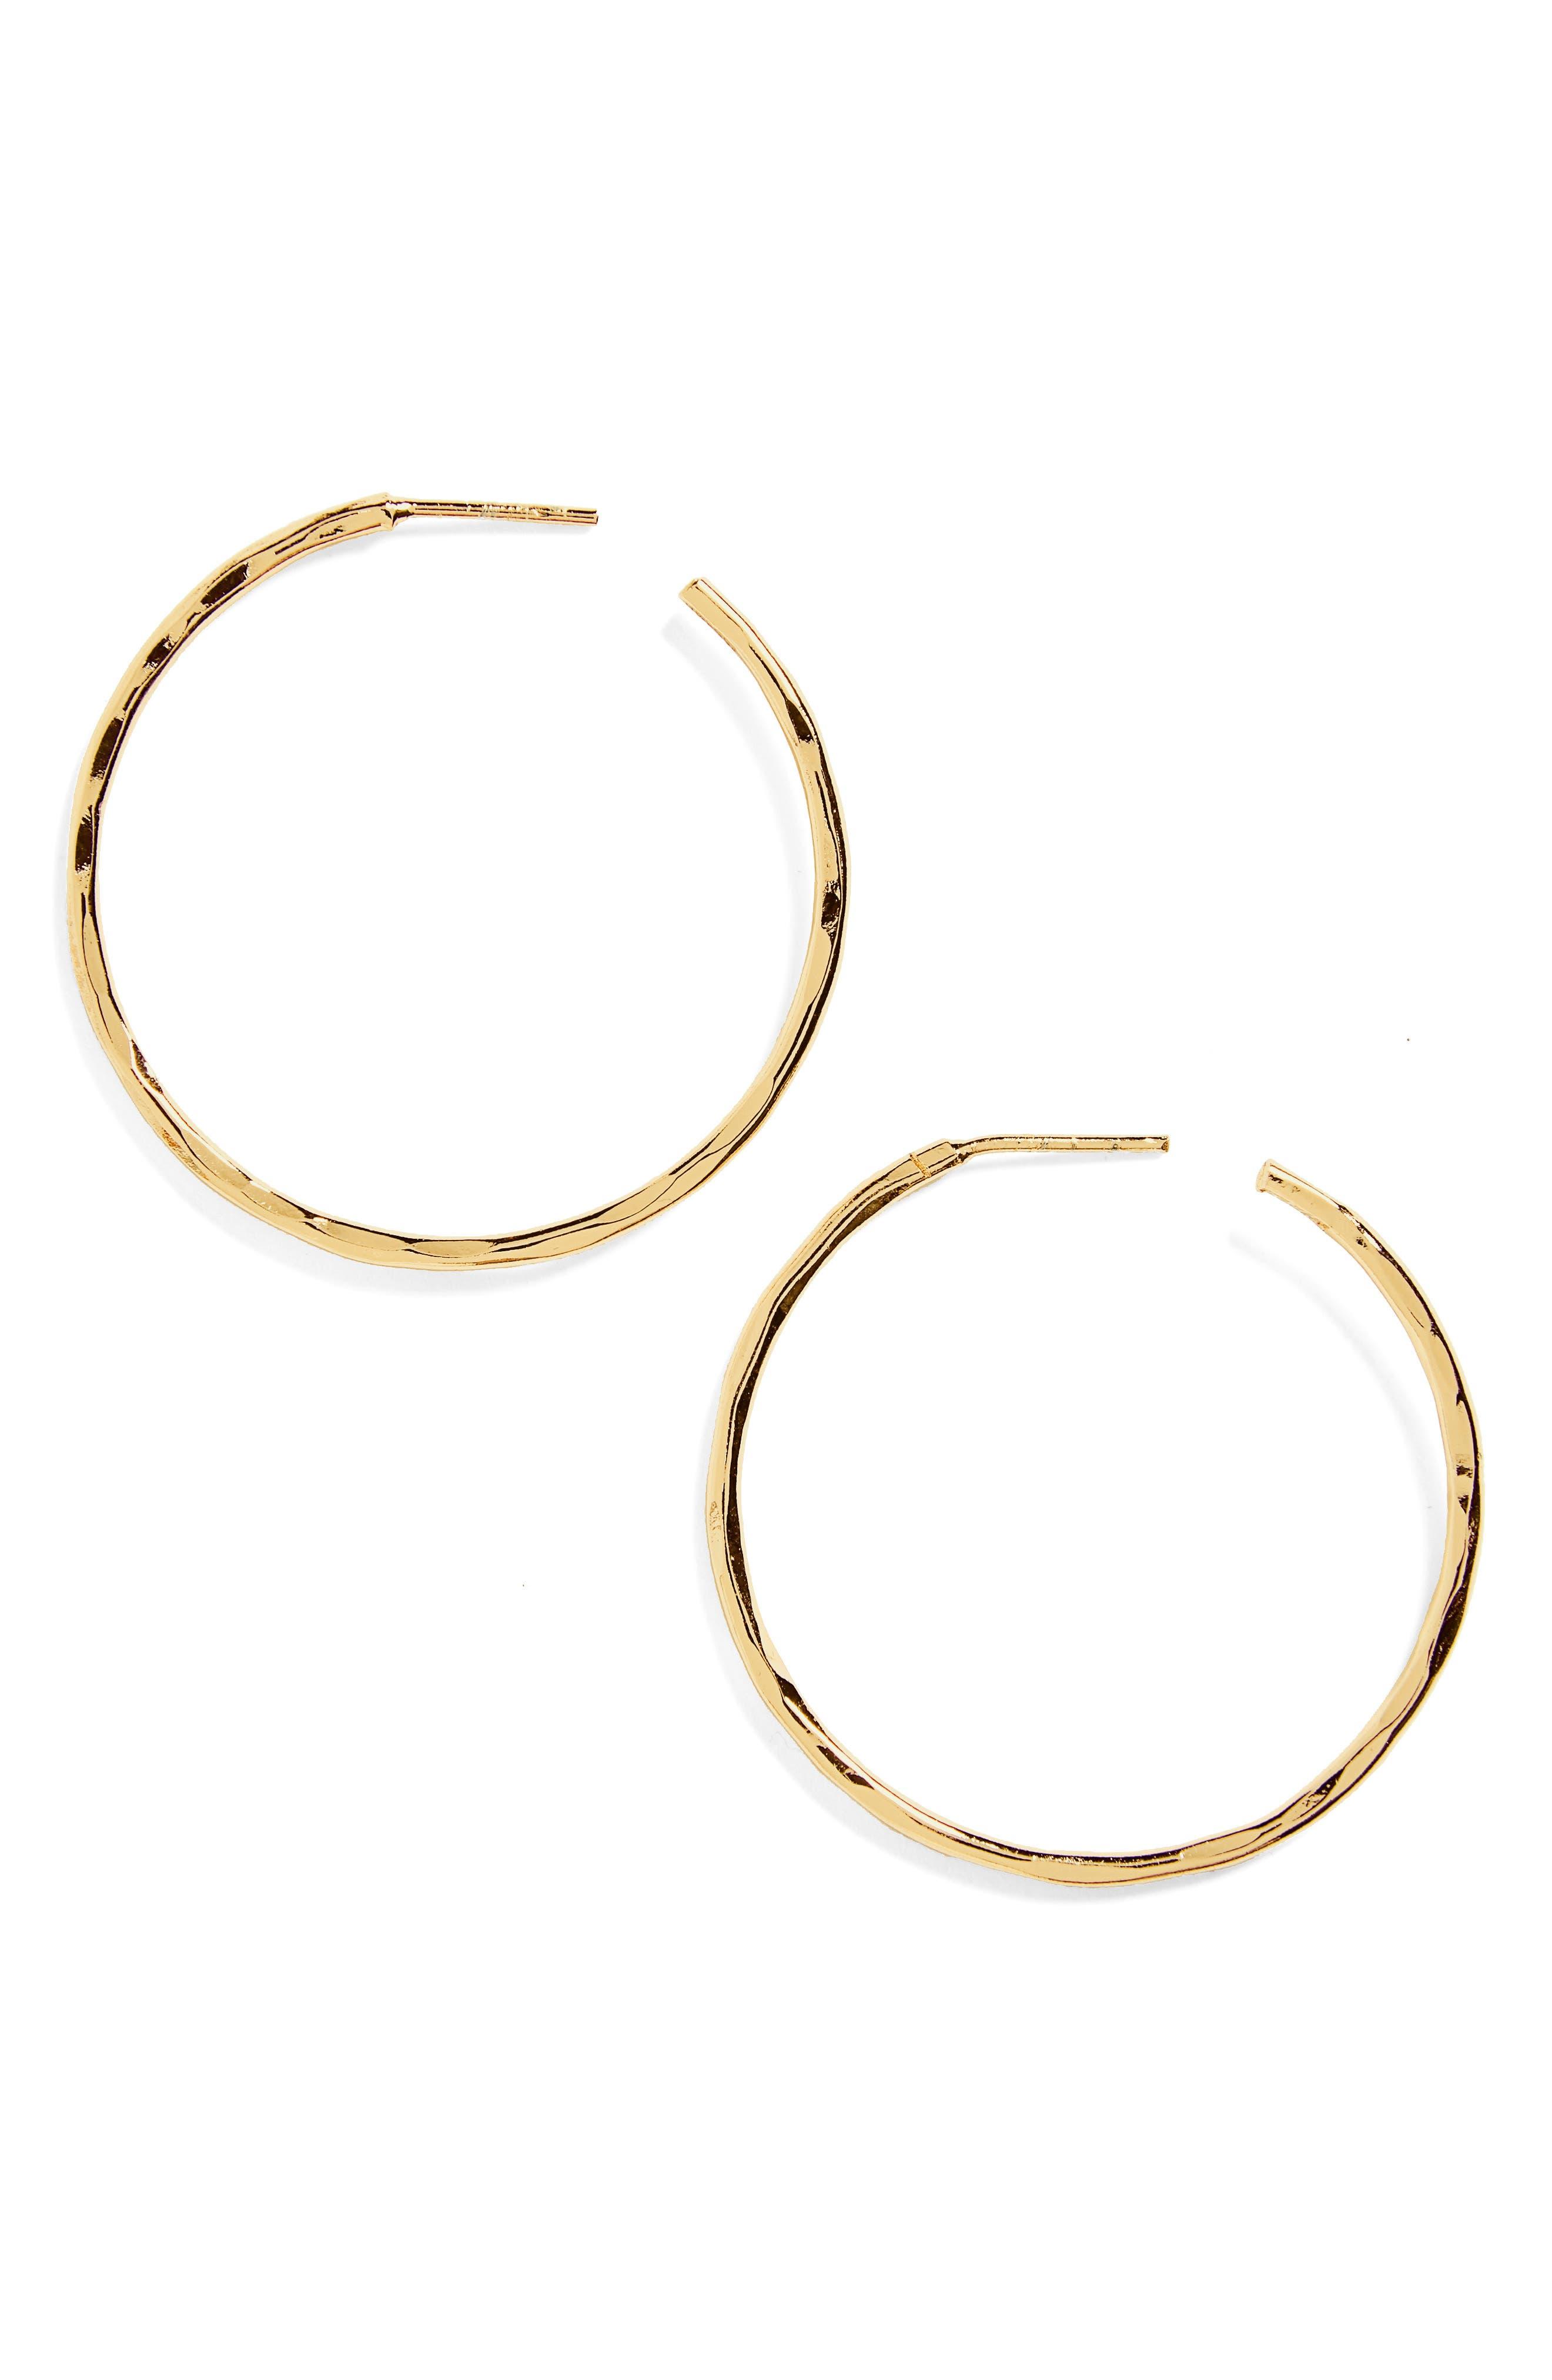 Medium Hammered Hoop Earrings,                             Main thumbnail 1, color,                             GOLD